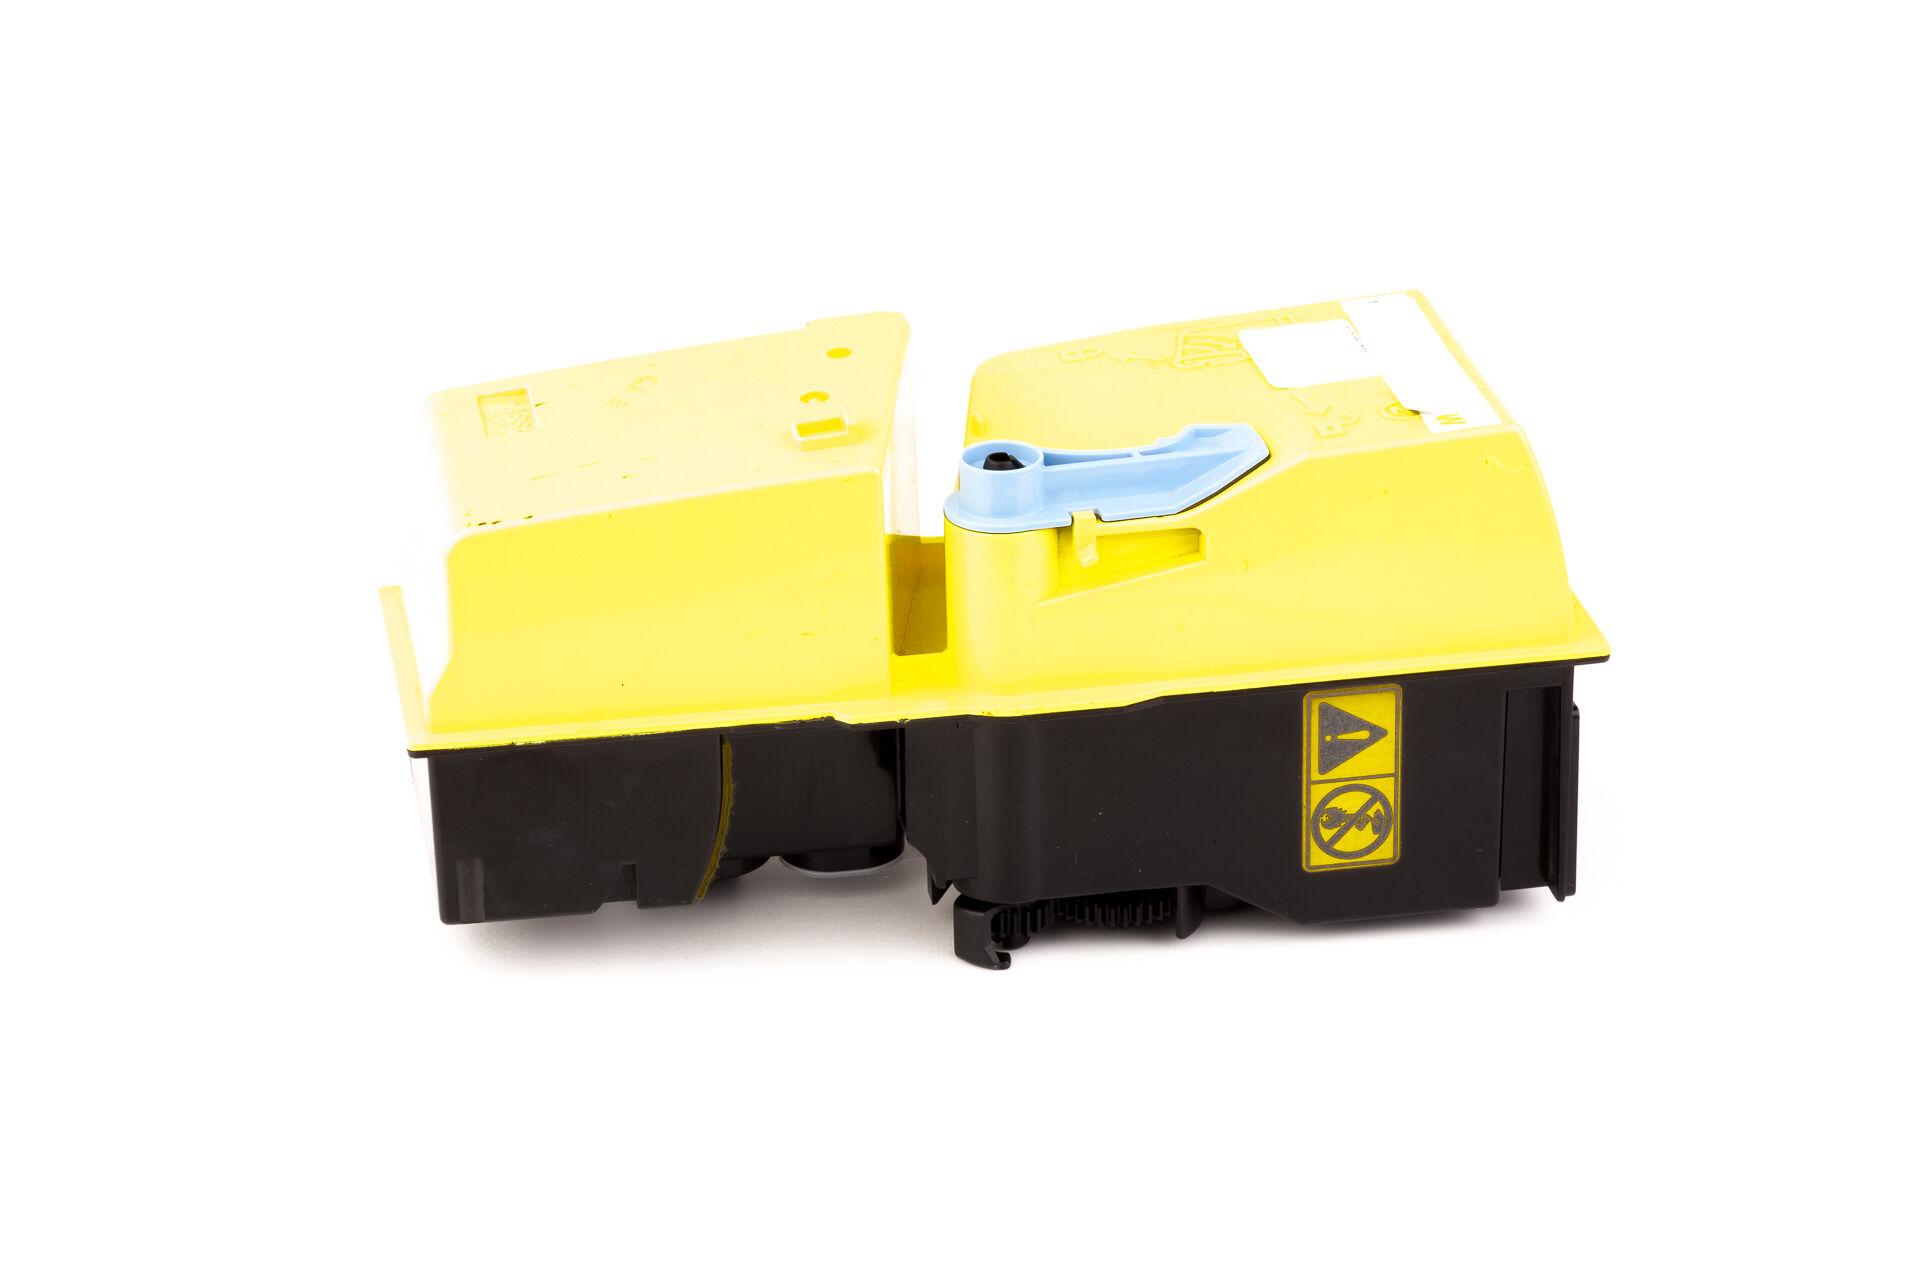 Kyocera Cartouche de Toner pour Kyocera 1T02FZBEU0 / TK-825 M magenta compatible (de marque ASC)